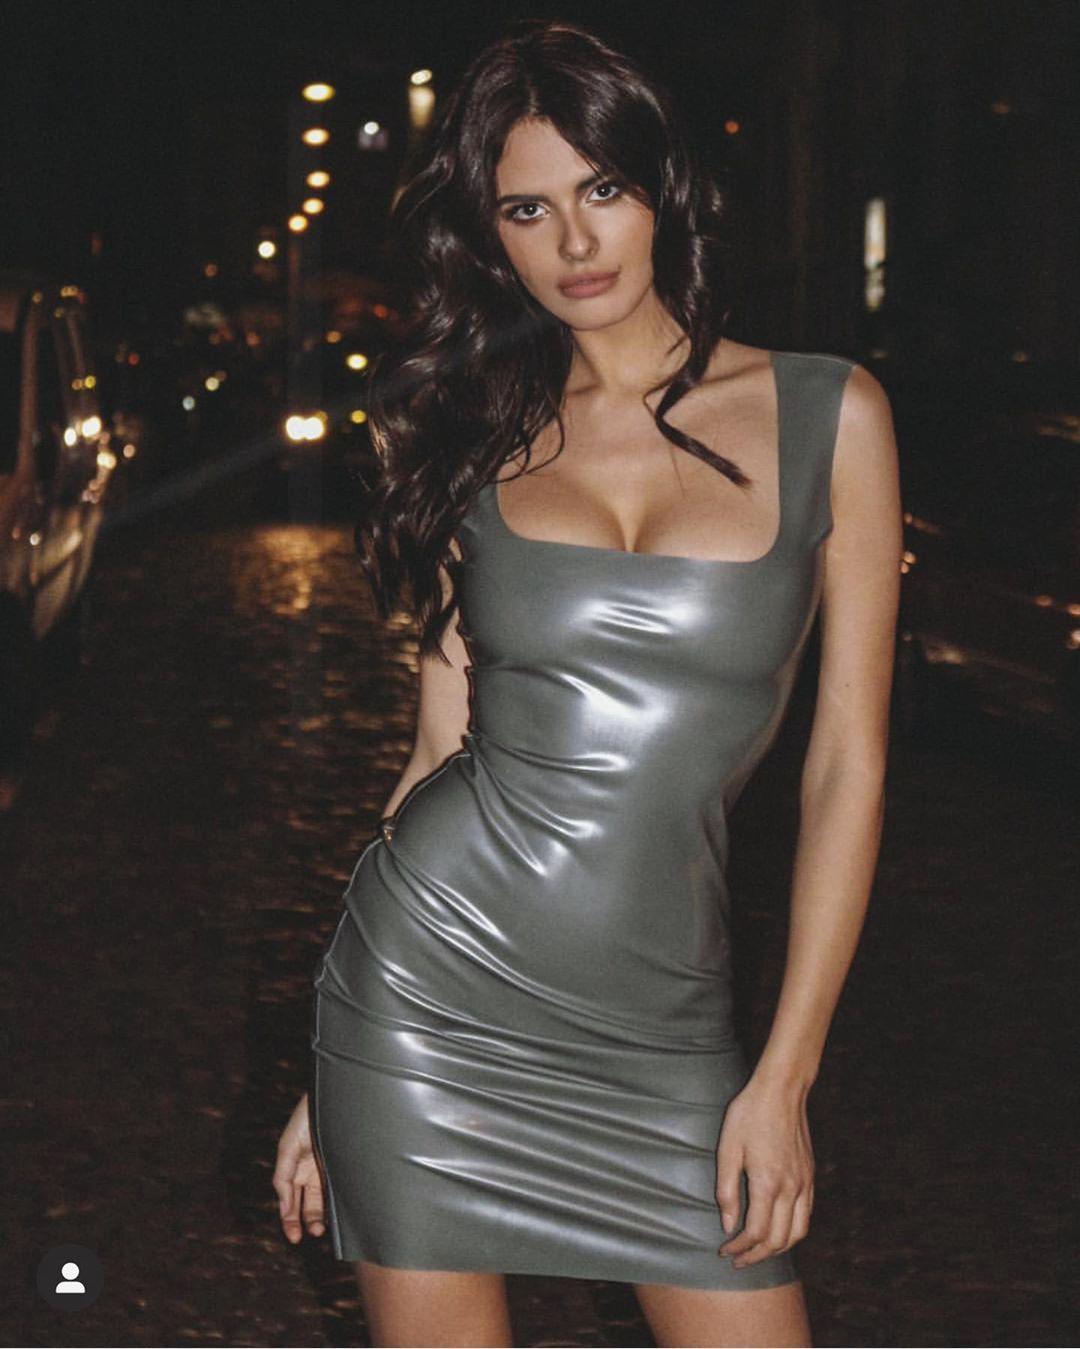 Bojana Krsmanovic dress latex clothing style outfit, hot legs